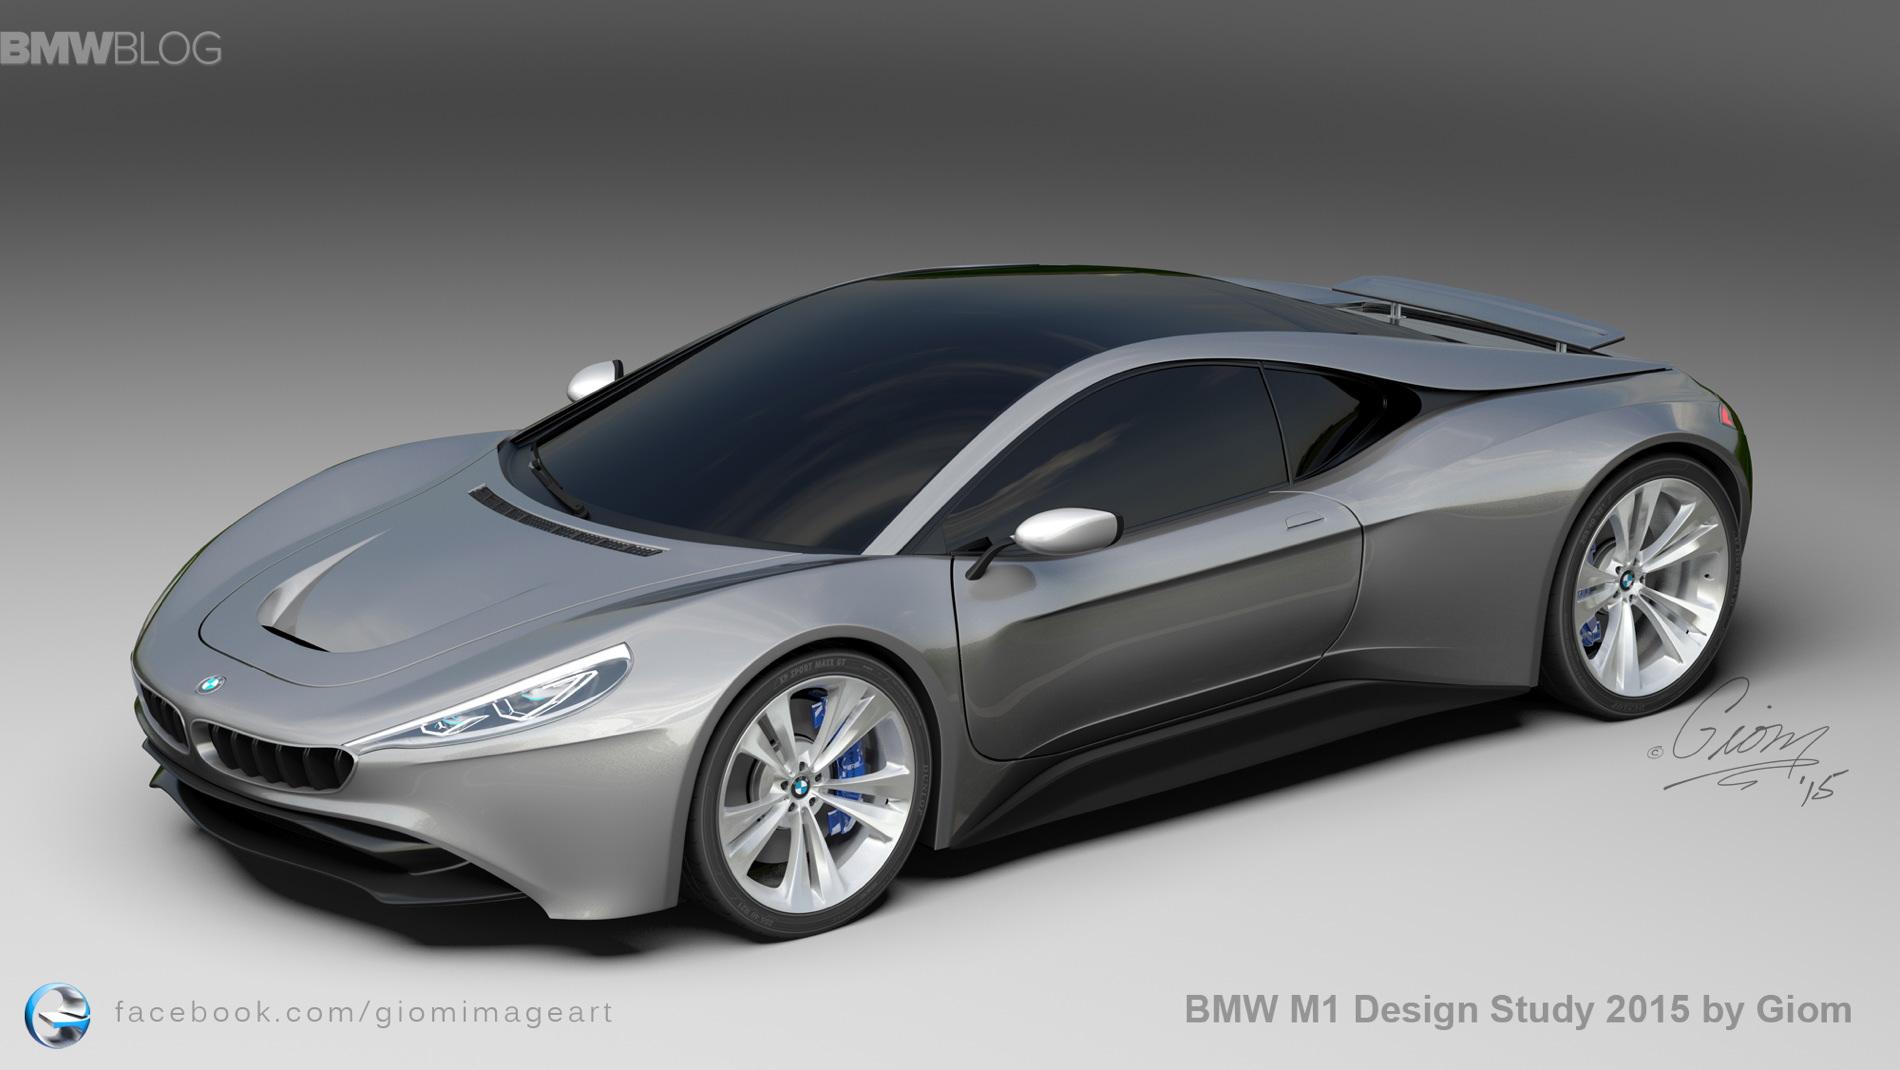 BMW M1 Design Study 2